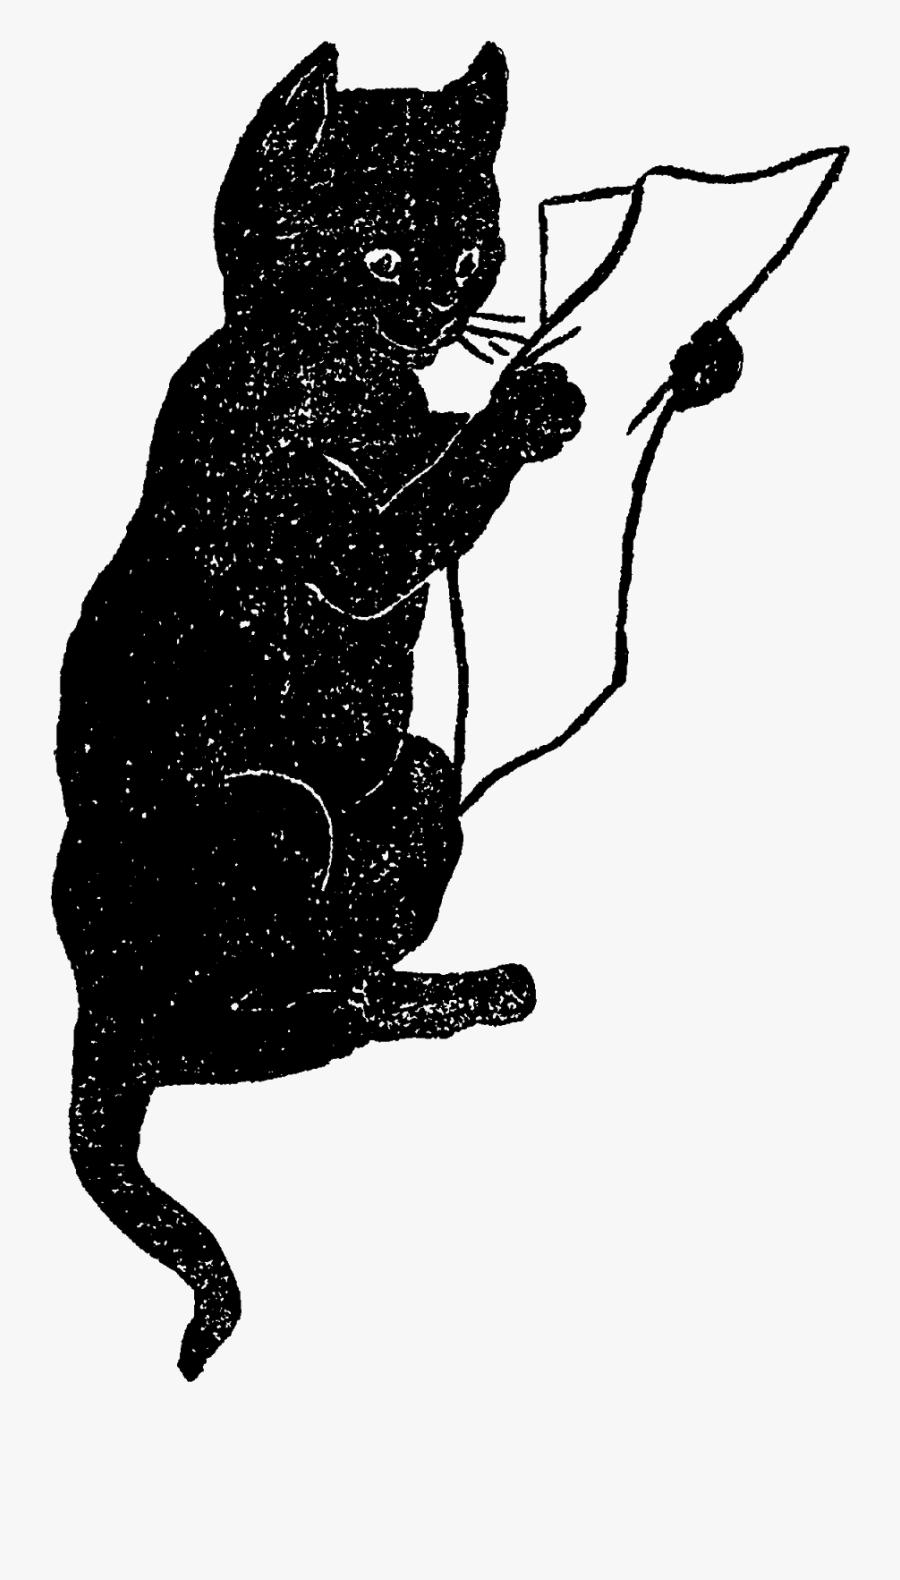 Black Cat Antique Illustration Funny Animal Clipart - Funny Cat Illustration Png, Transparent Clipart